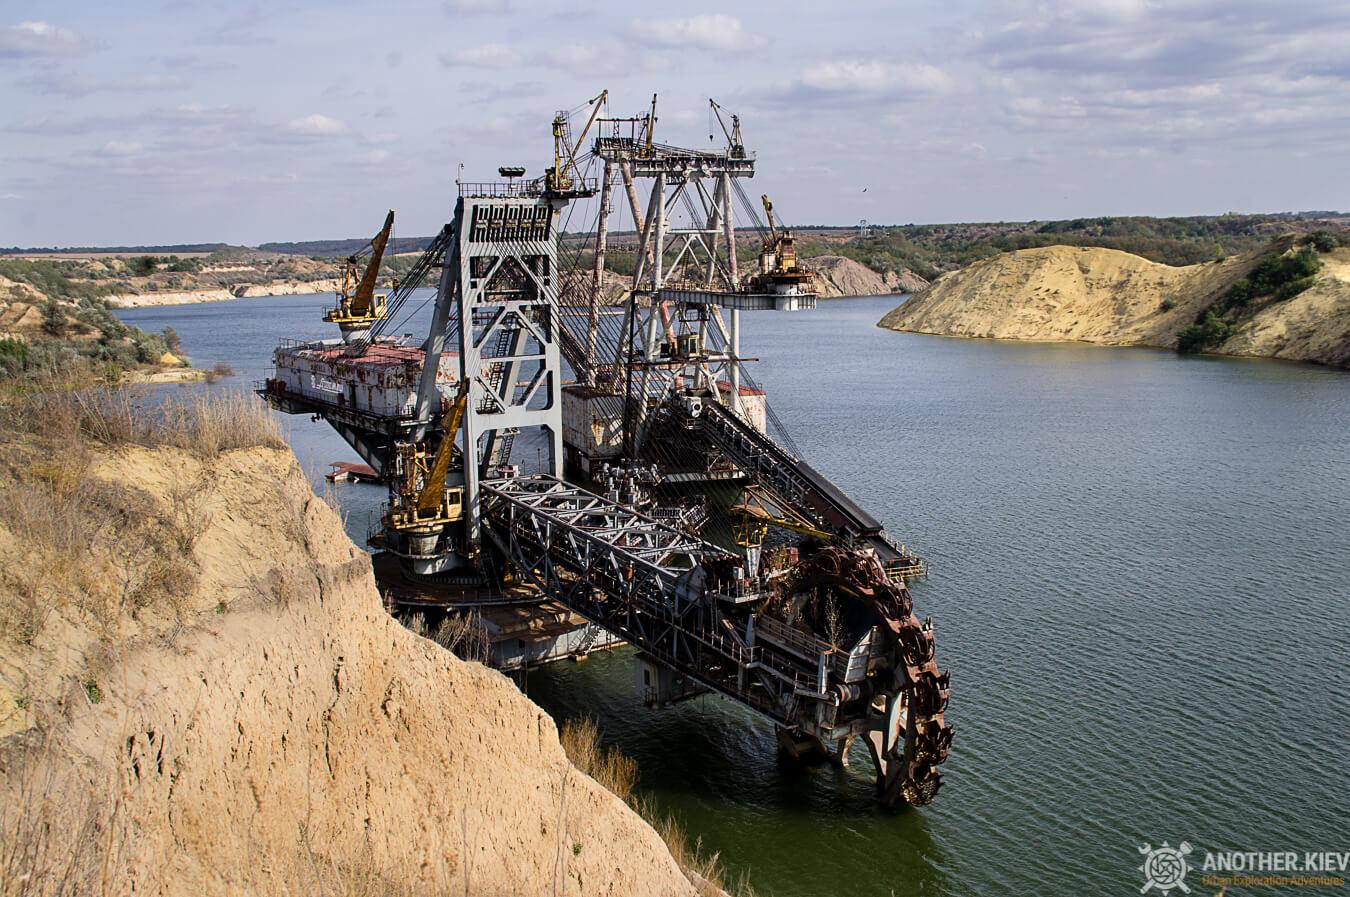 quarry and submerged excavator